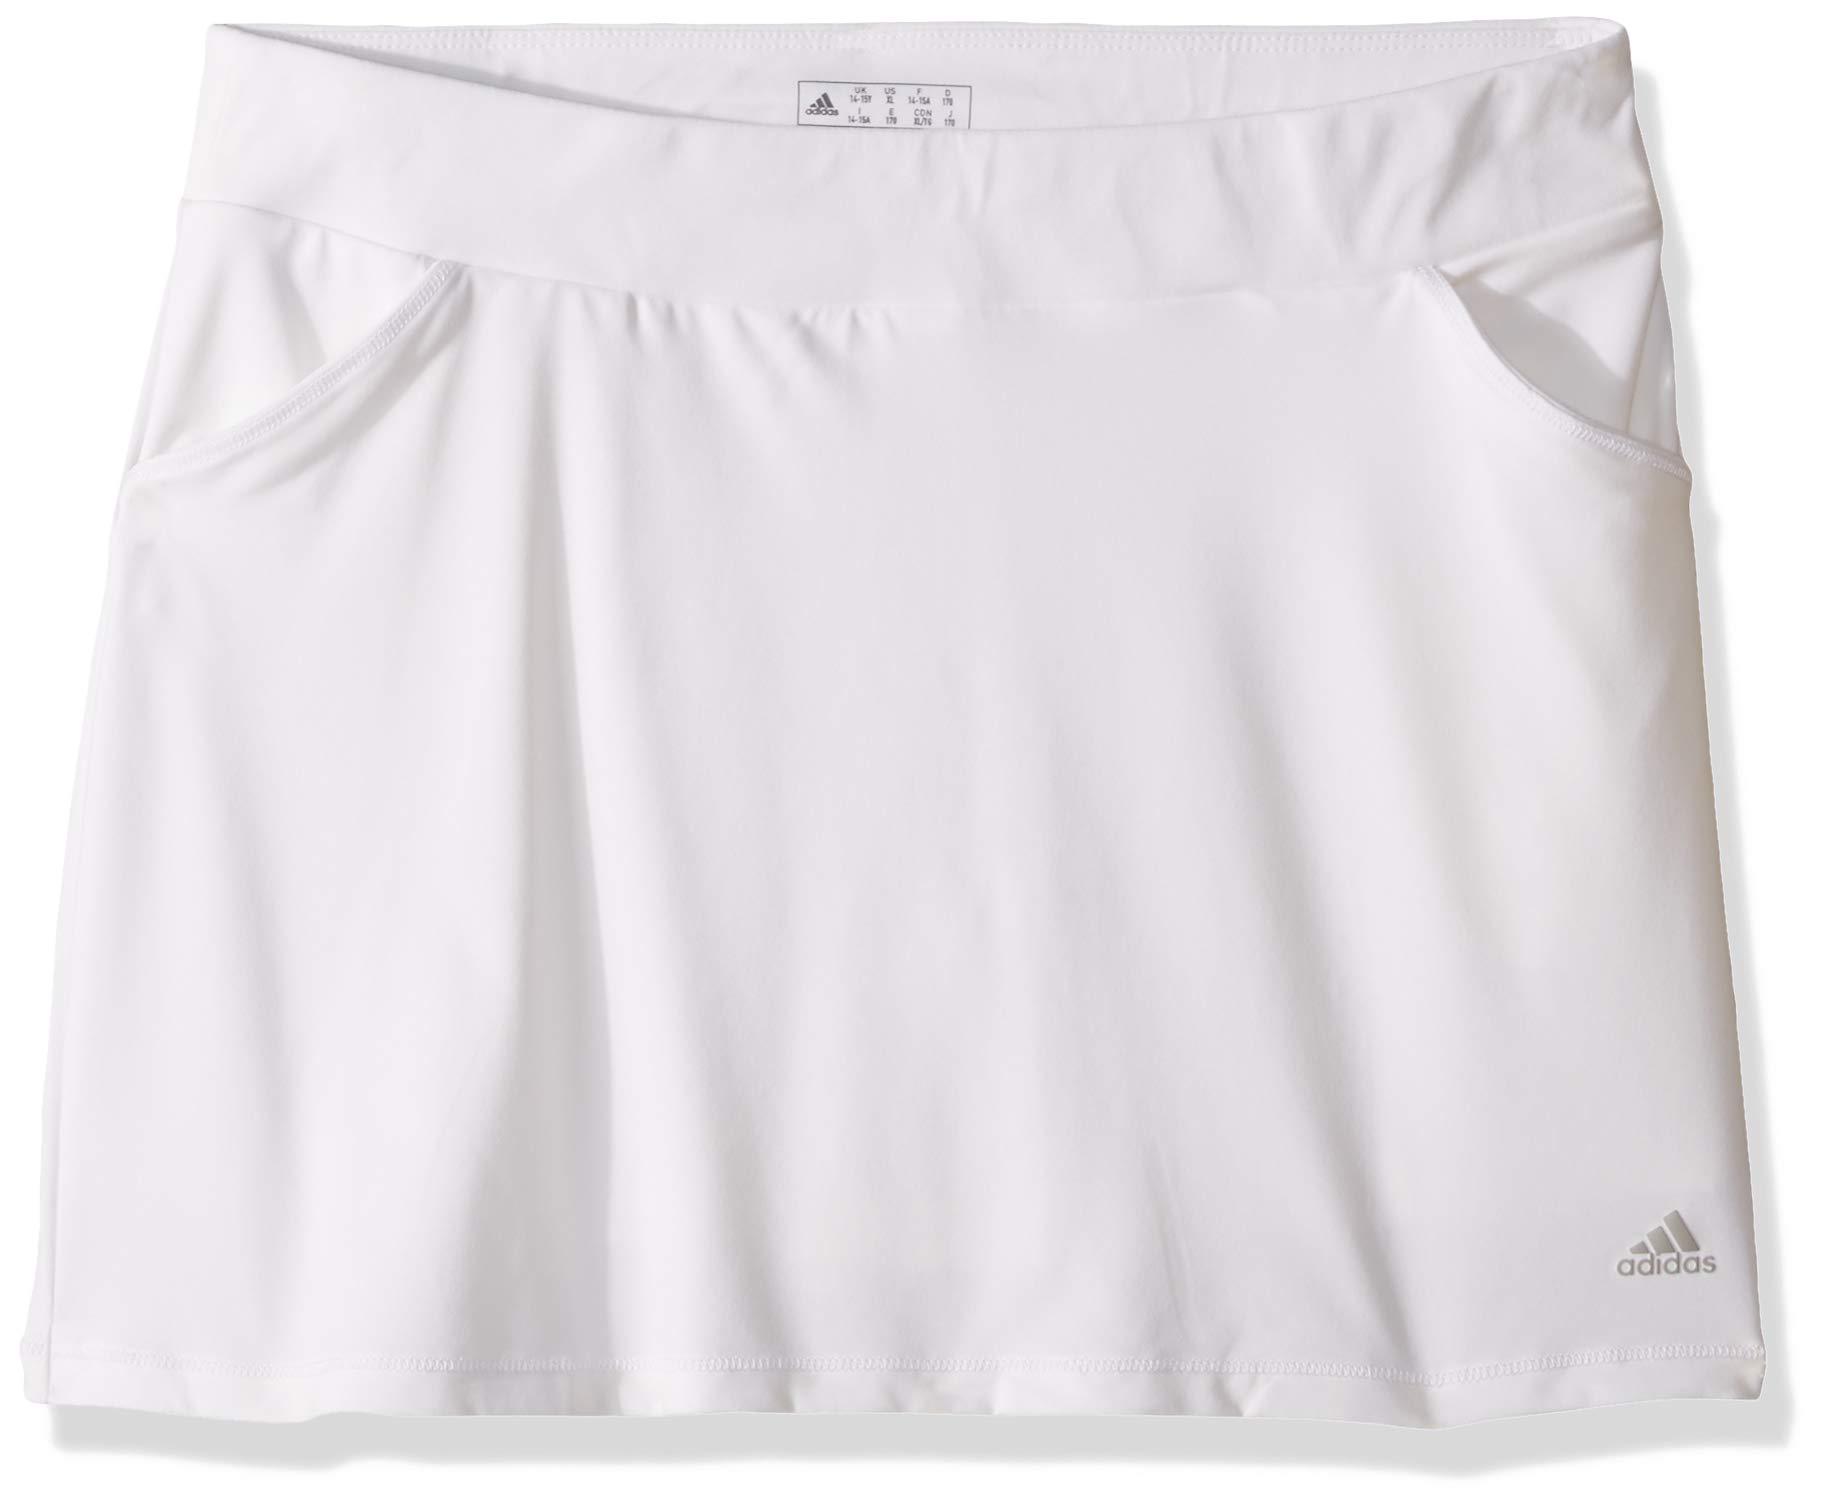 adidas Golf Printed Golf Skort, White, X-Large by adidas